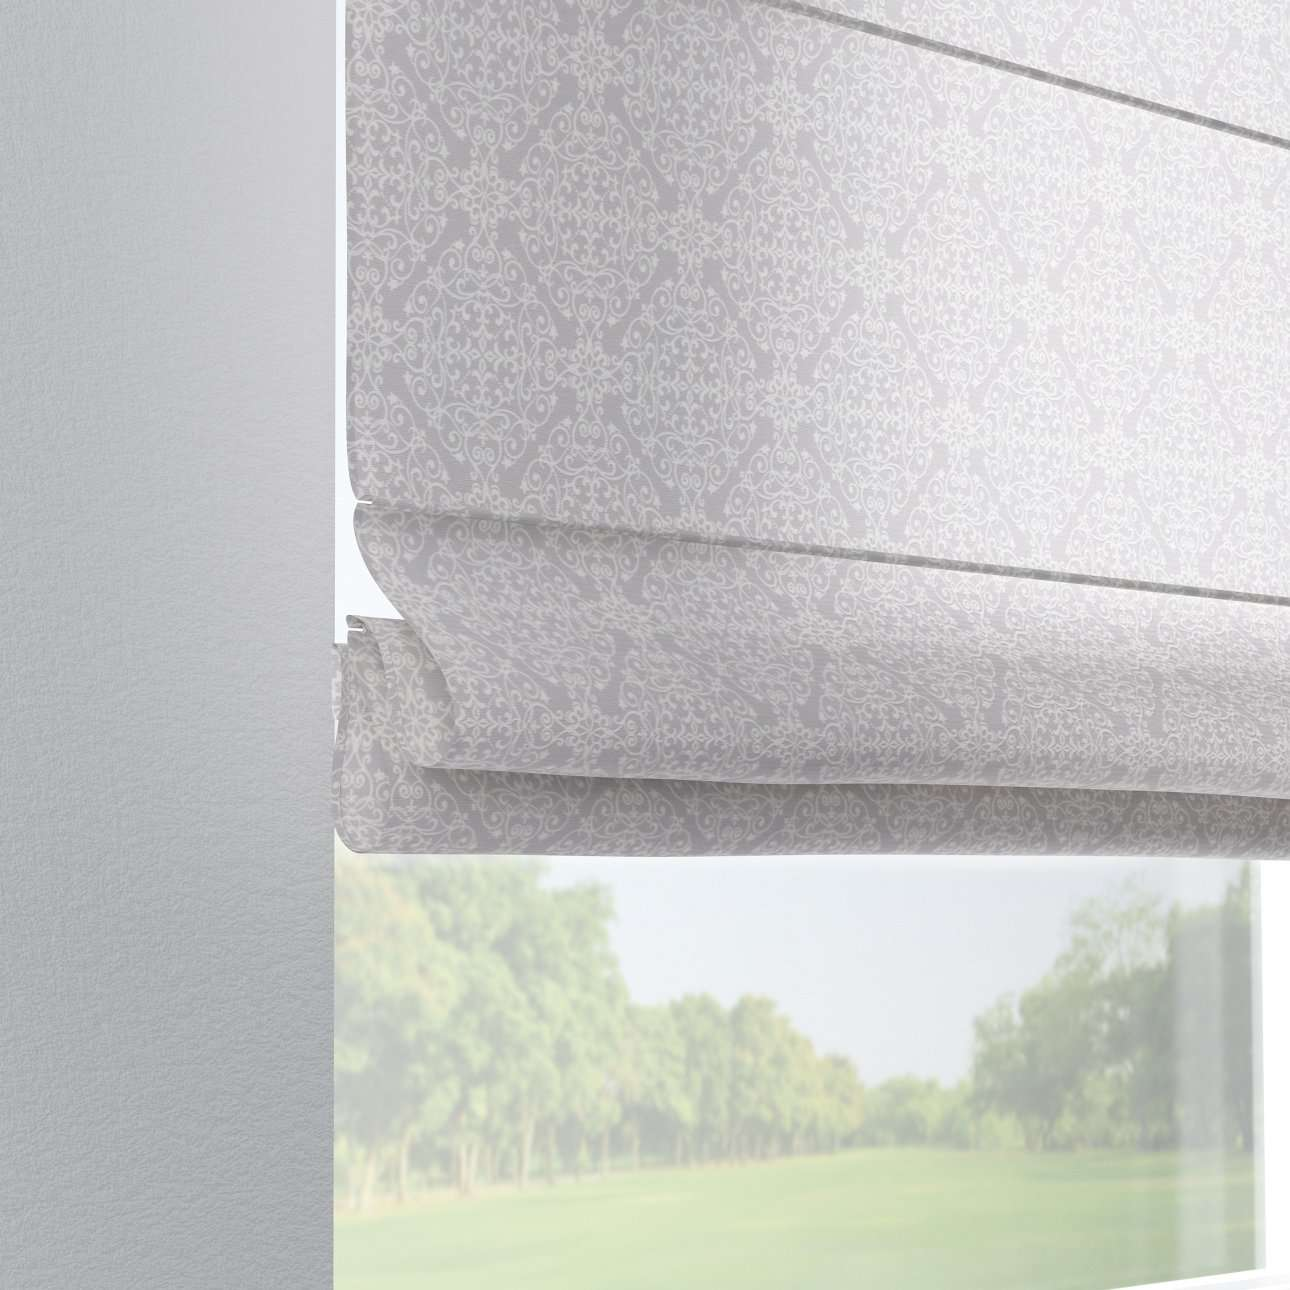 Foldegardin Verona<br/>Med stropper til gardinstang 80 x 170 cm fra kollektionen Flowers, Stof: 140-38